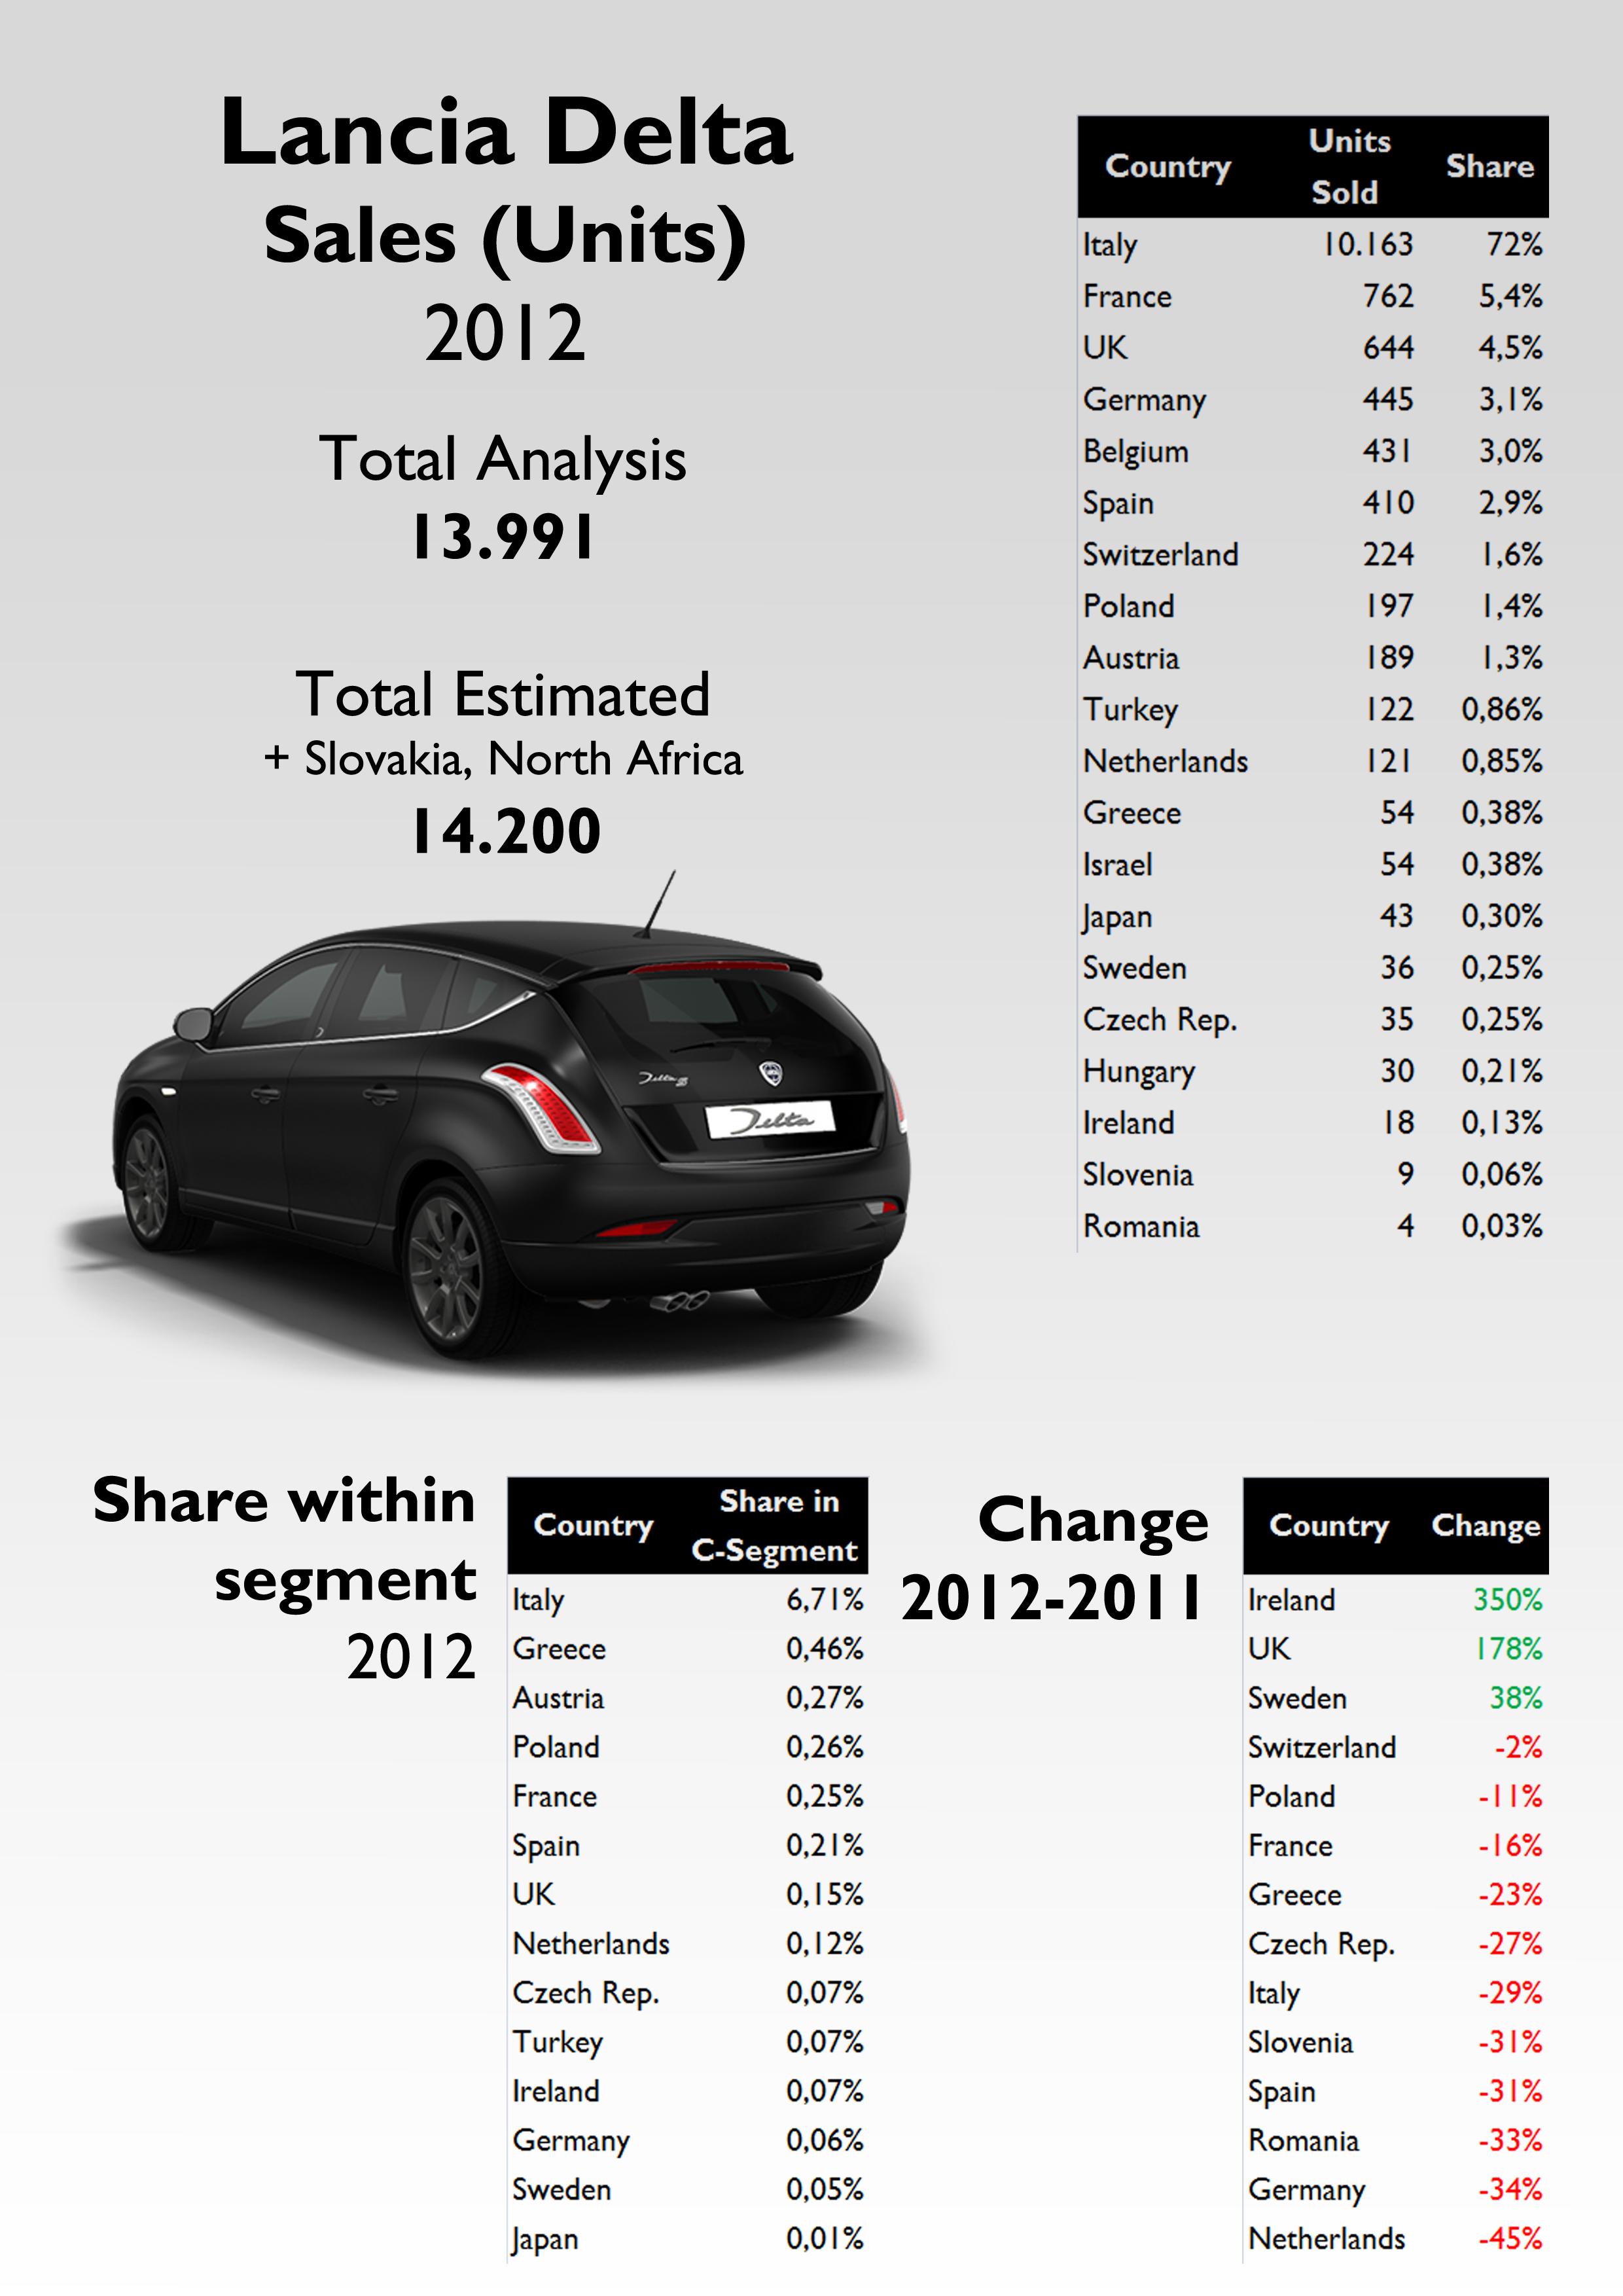 Lancia Delta 2012 Full Year Analysis